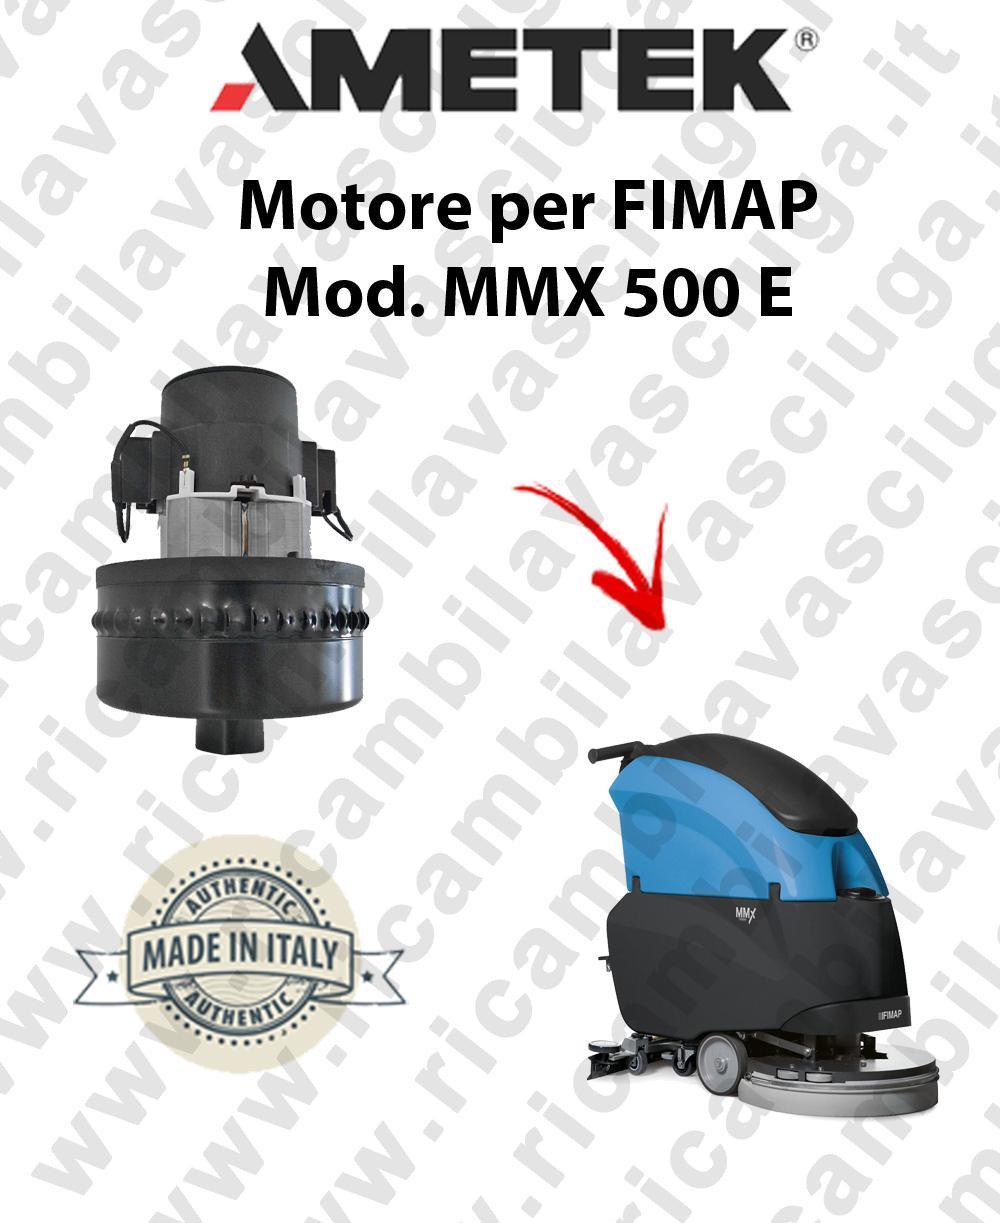 MMX 500 E Ametek Vacuum Motor scrubber dryer FIMAP